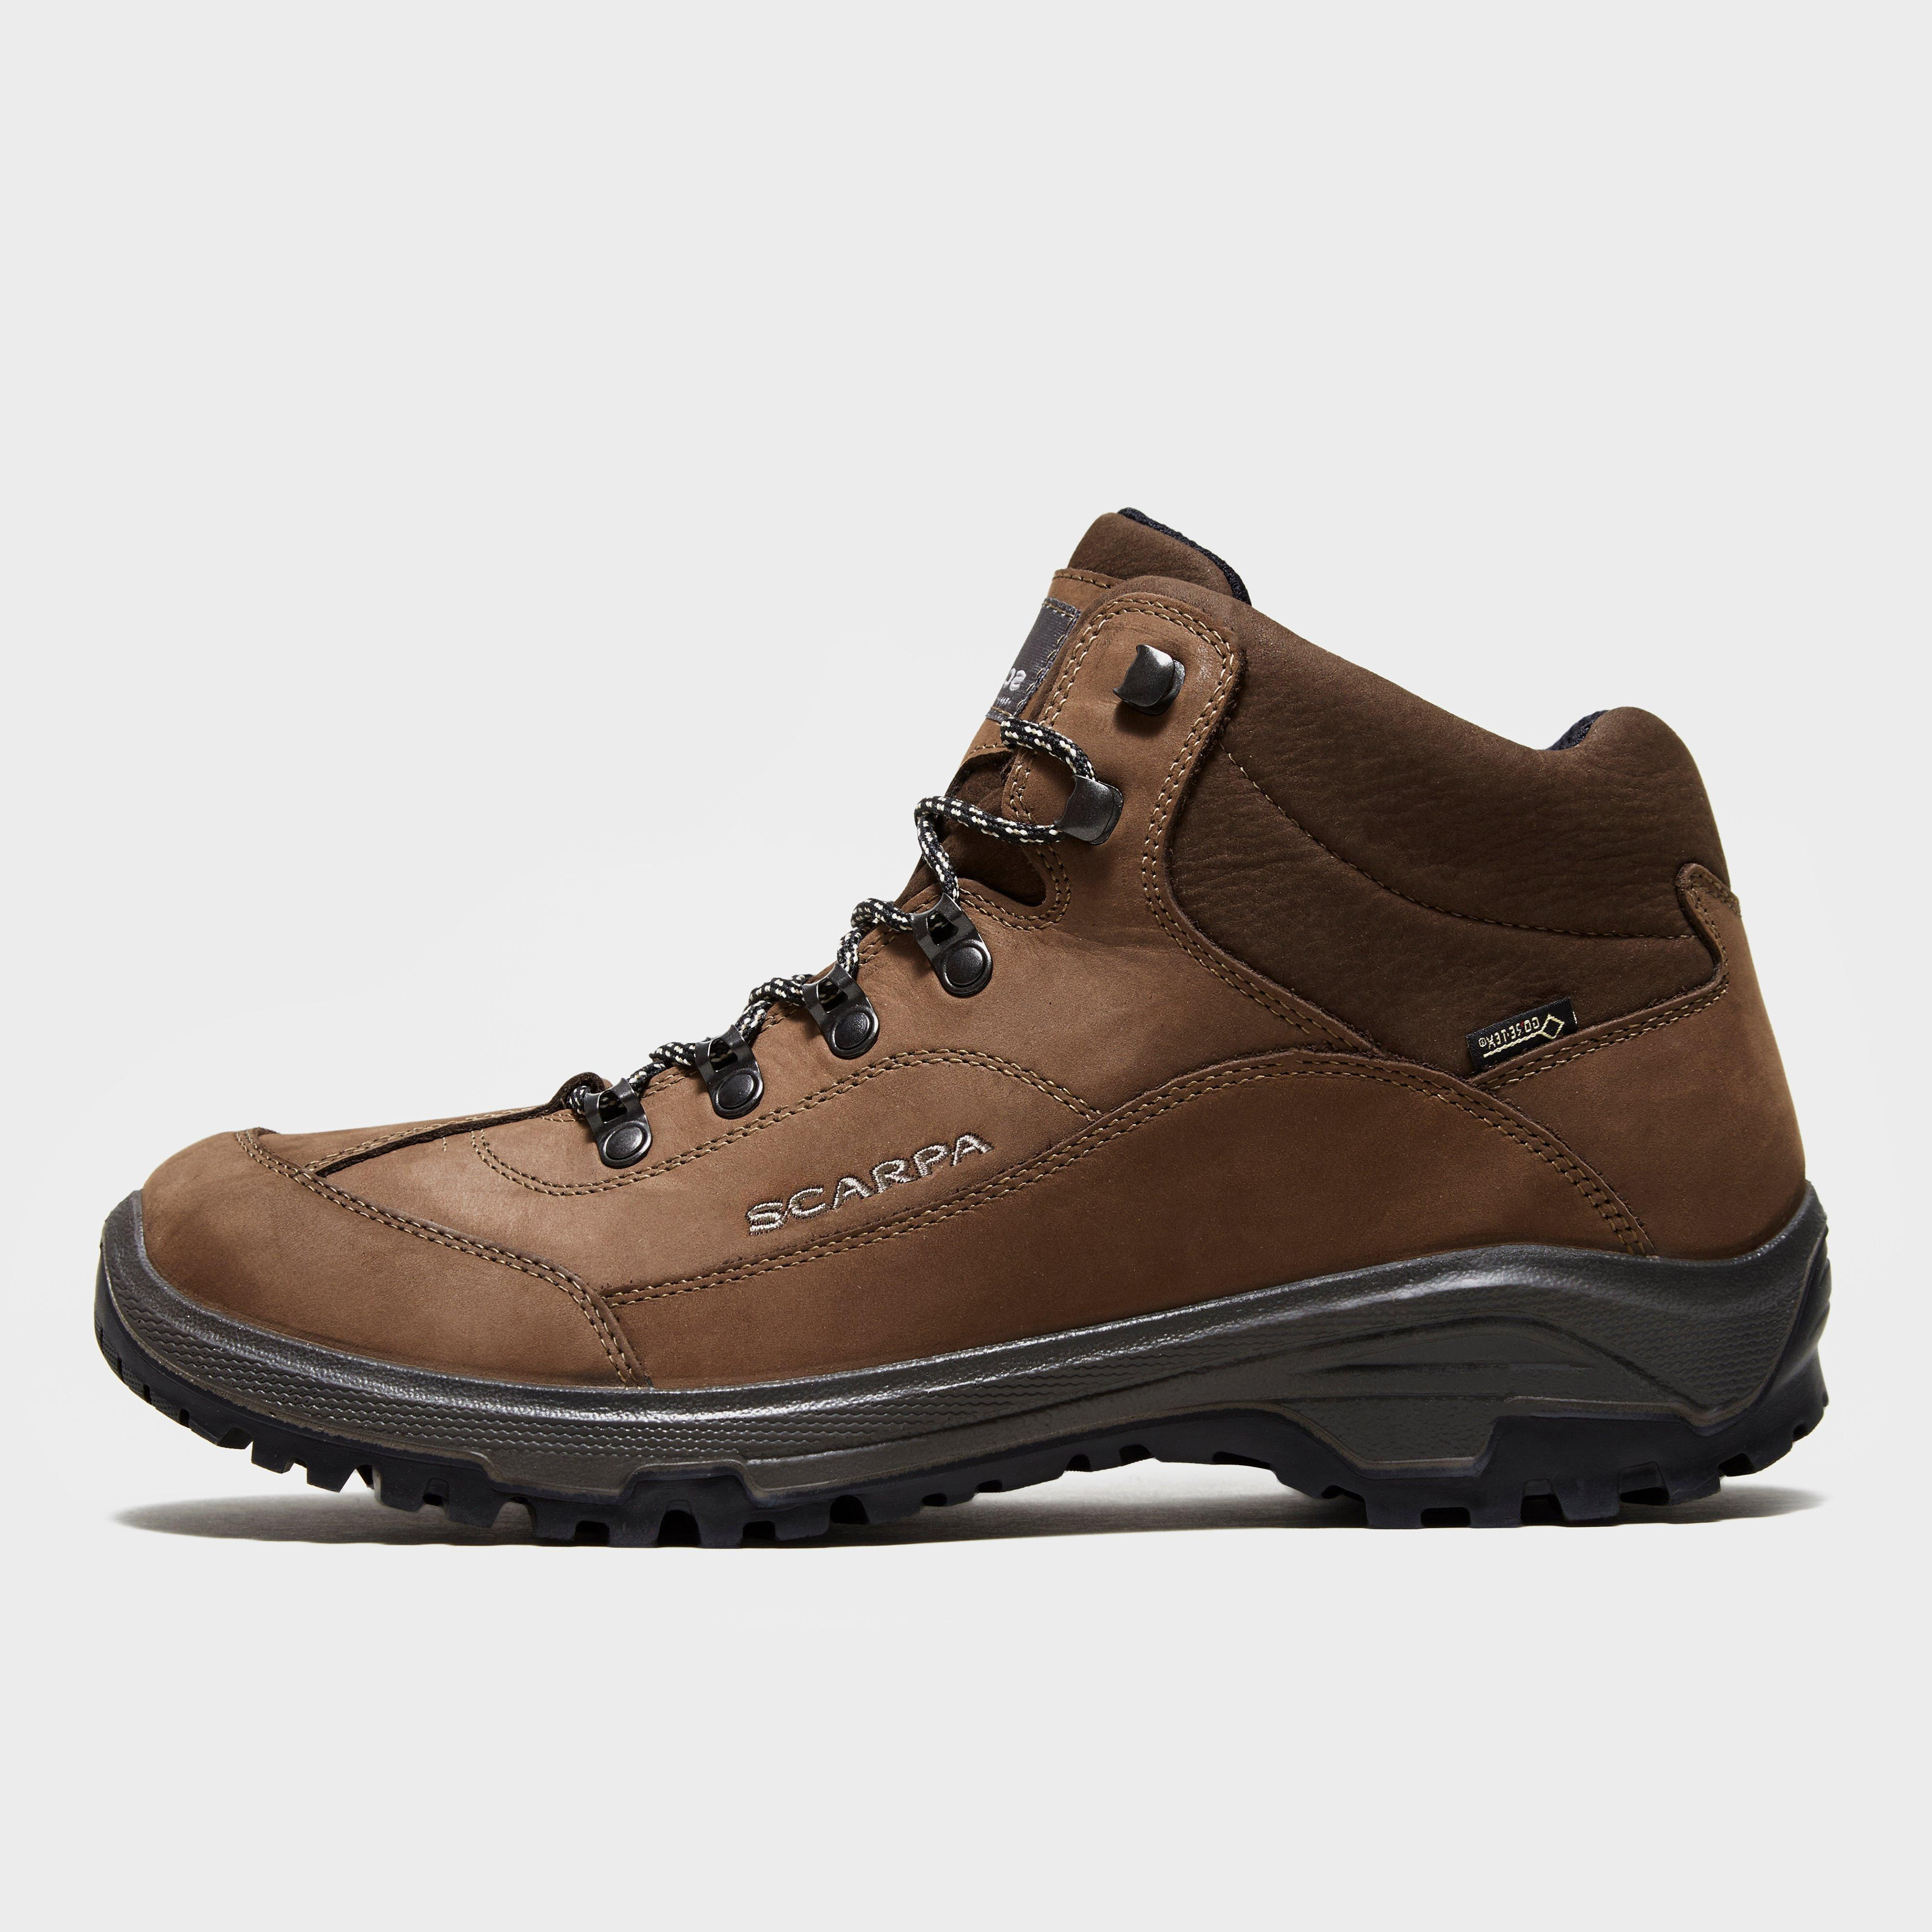 8cef1207d30 Brown SCARPA Men s Cyrus Mid GORE-TEX® Boot image 1